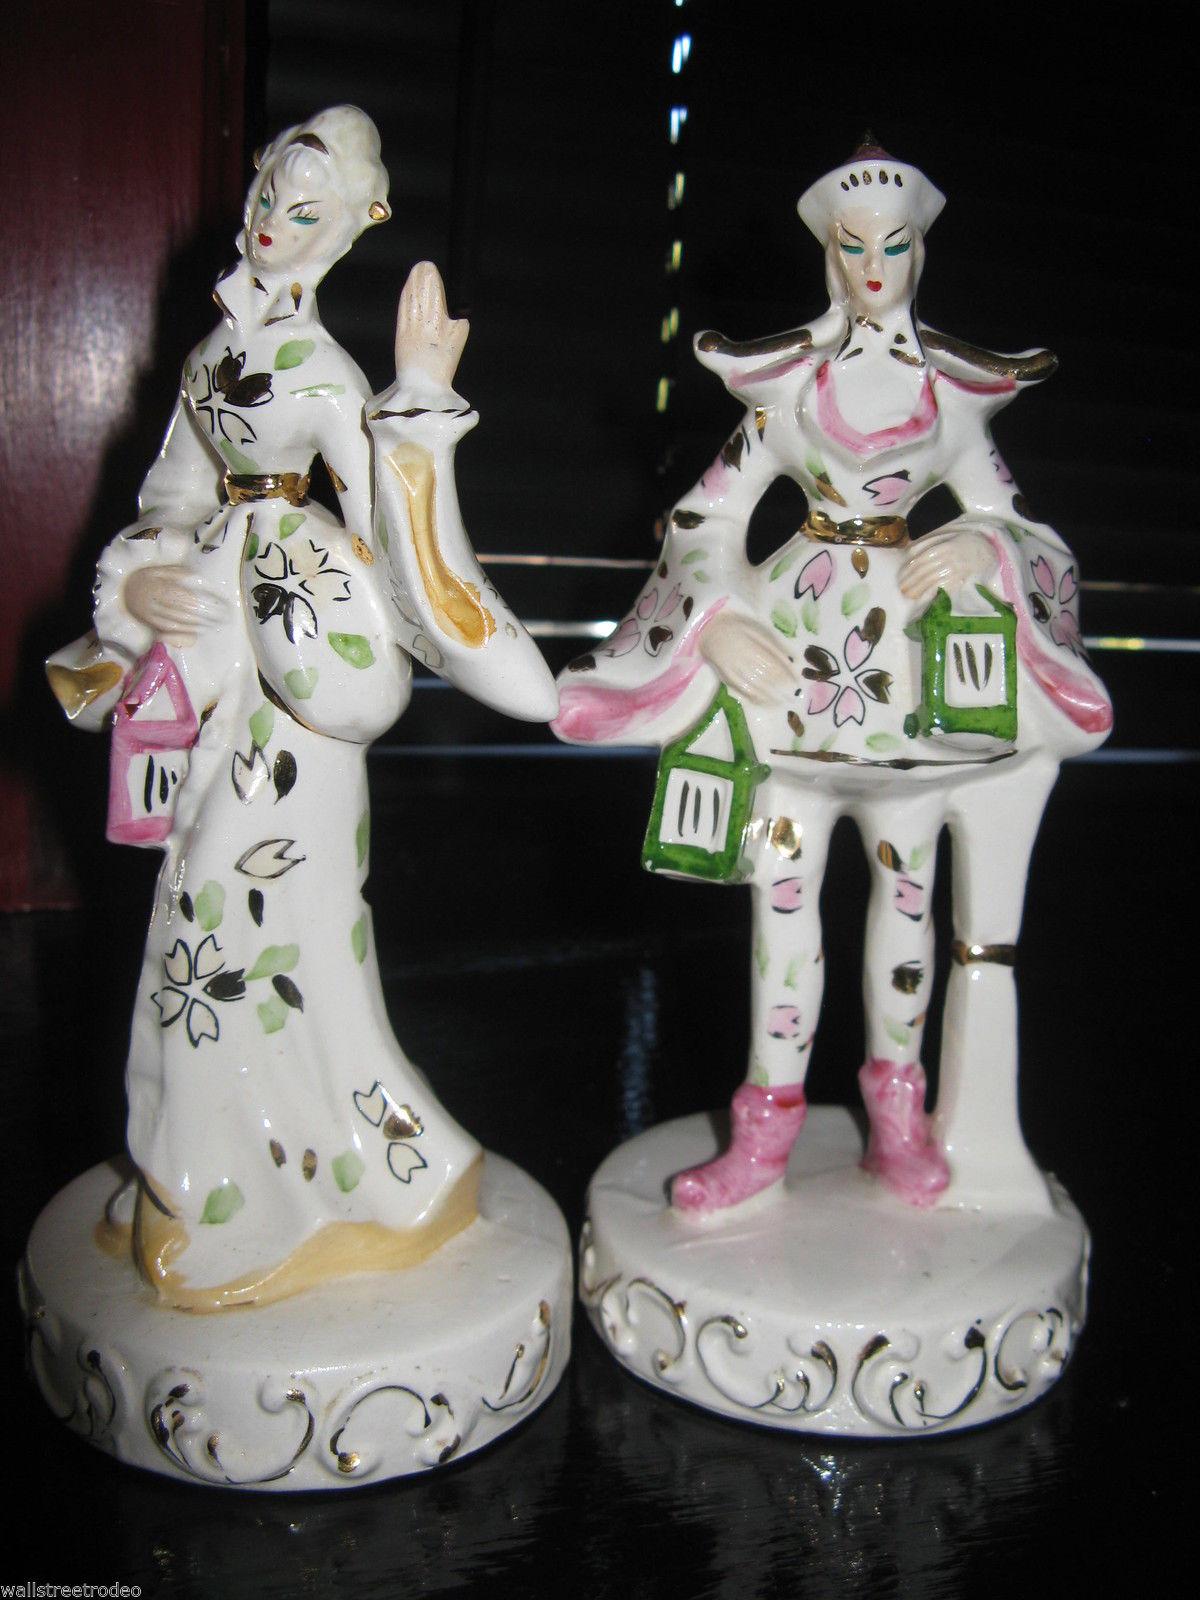 Vintage mid century european japan asian chinese figurines porcelain china VLV